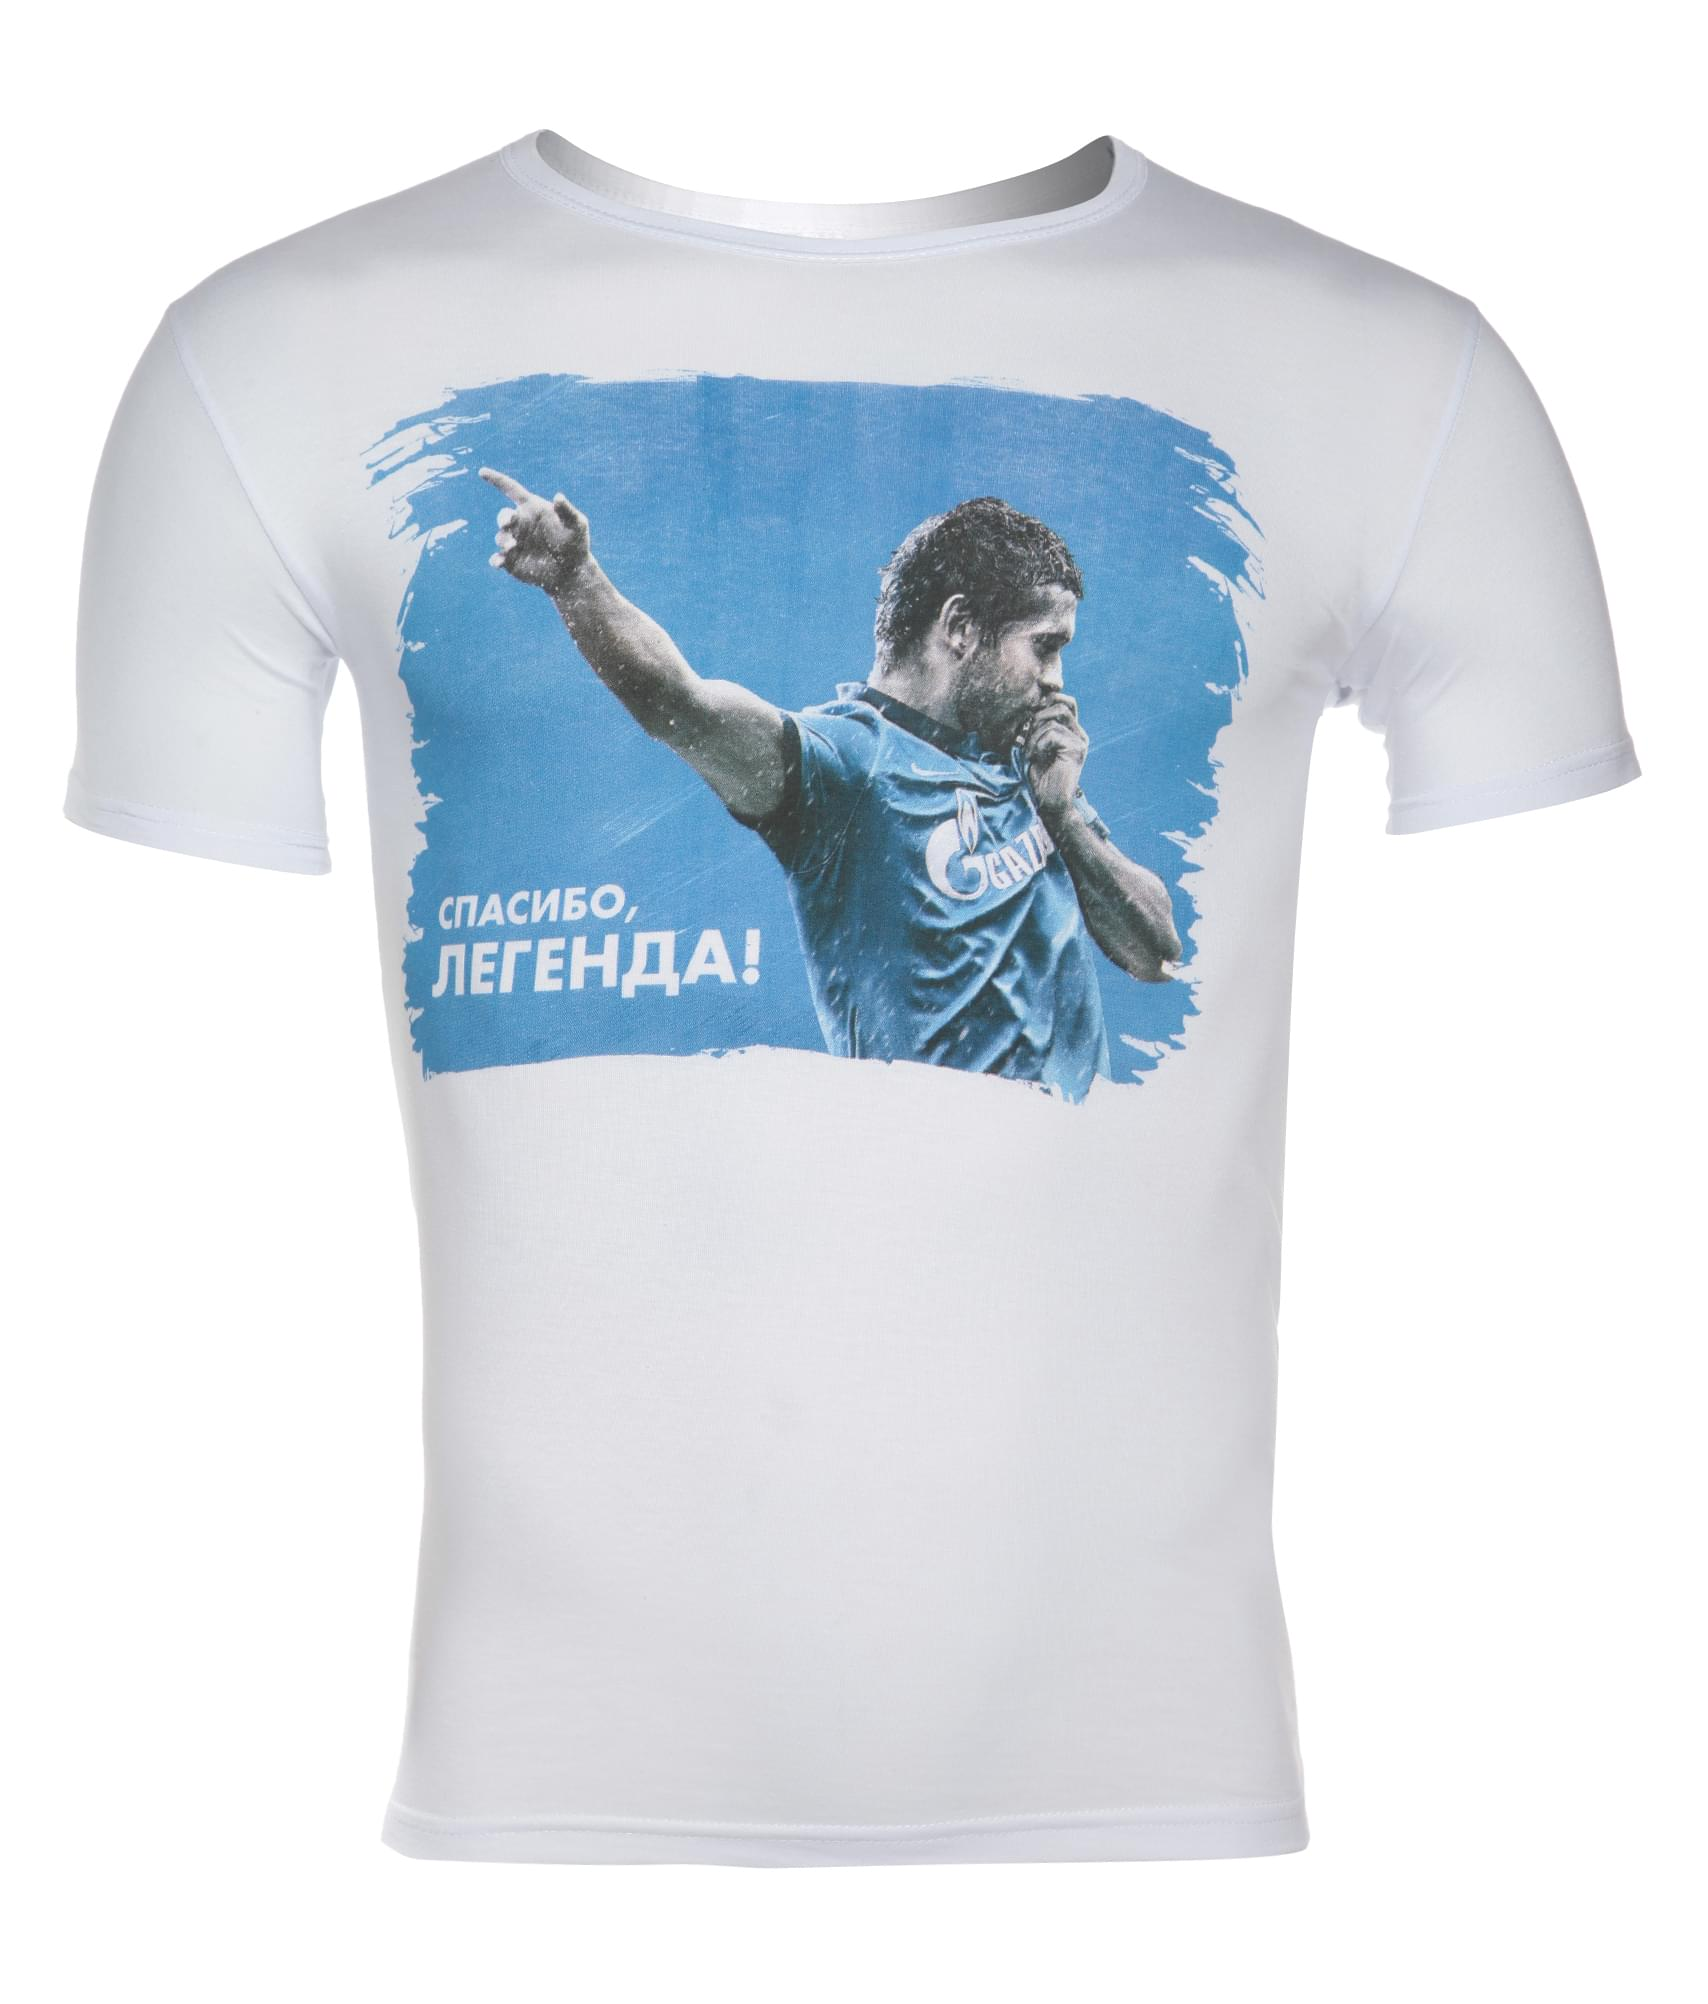 Футболка мужская «Спасибо,Легенда!», Размер-XXL поло rps футболки поло